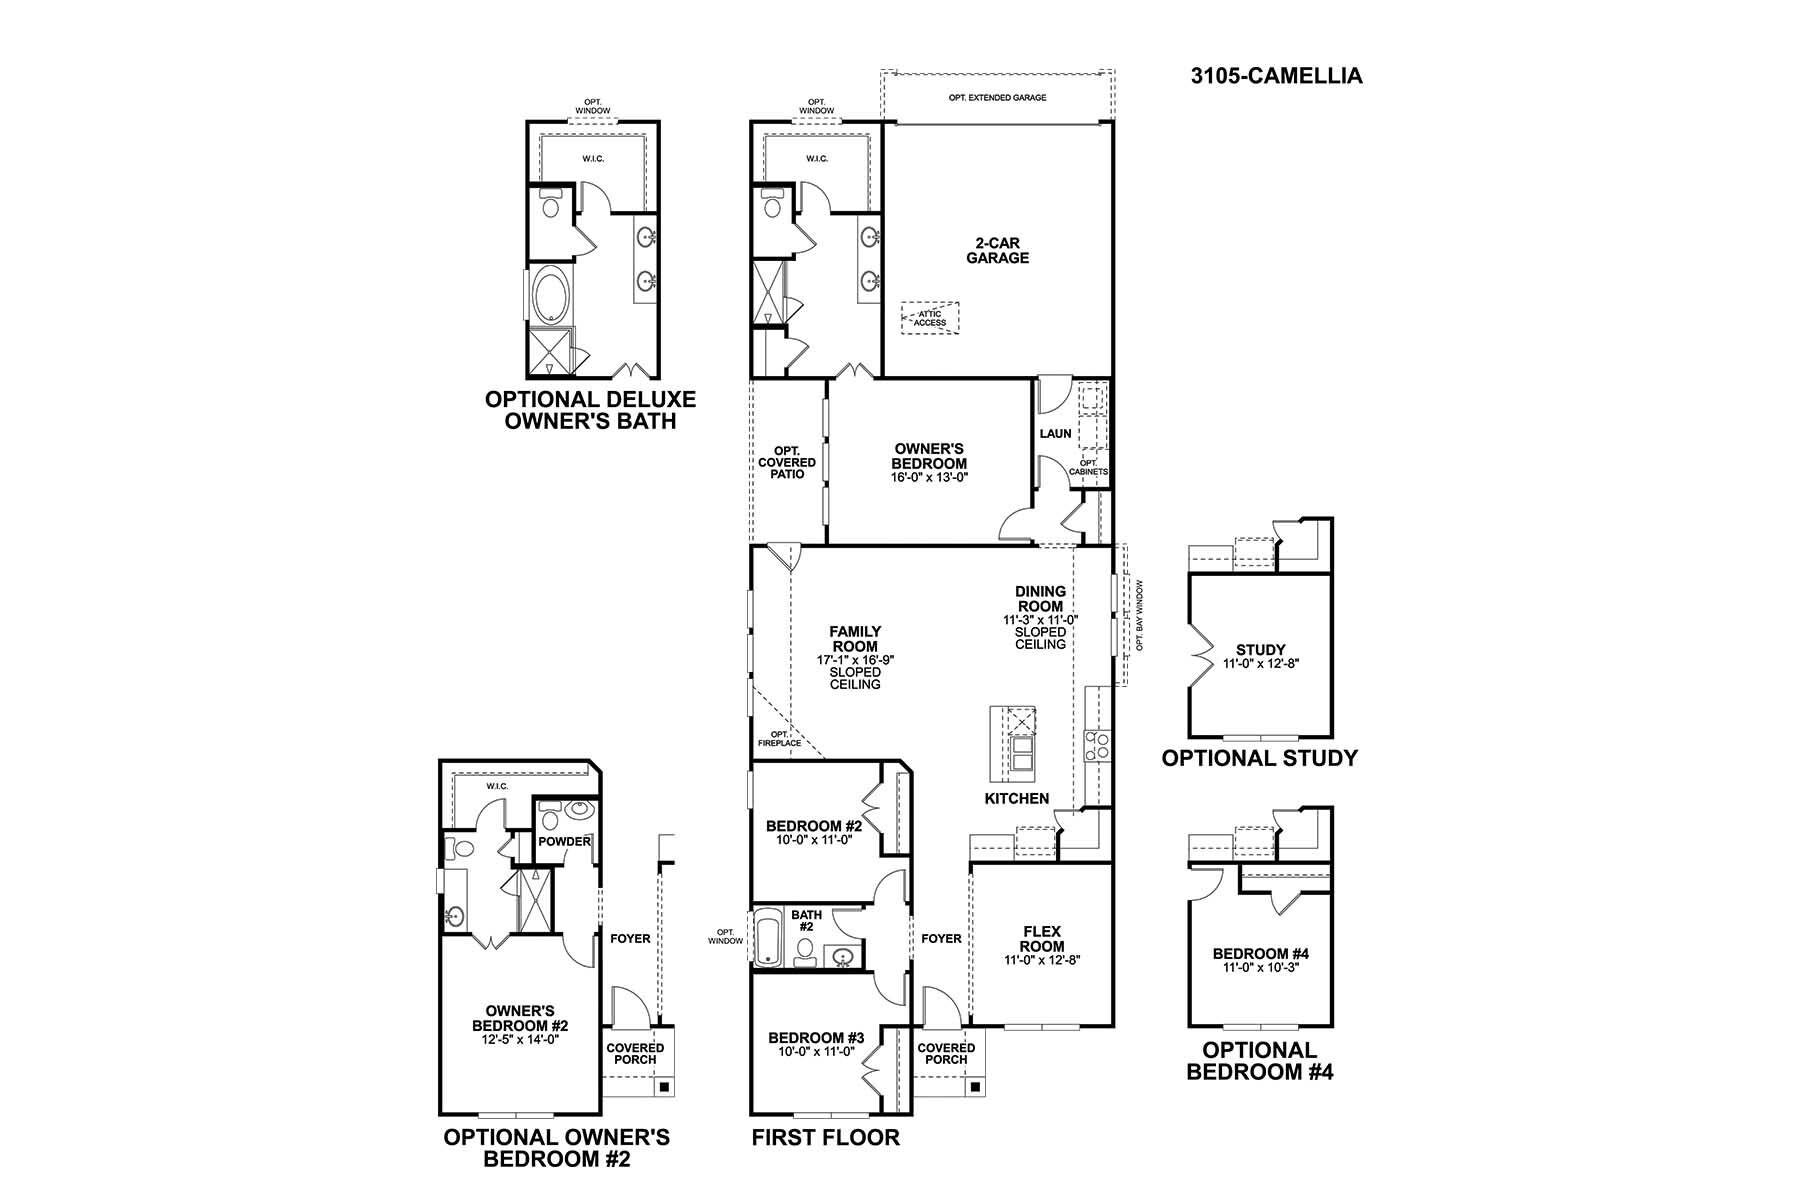 Camellia Floorplan